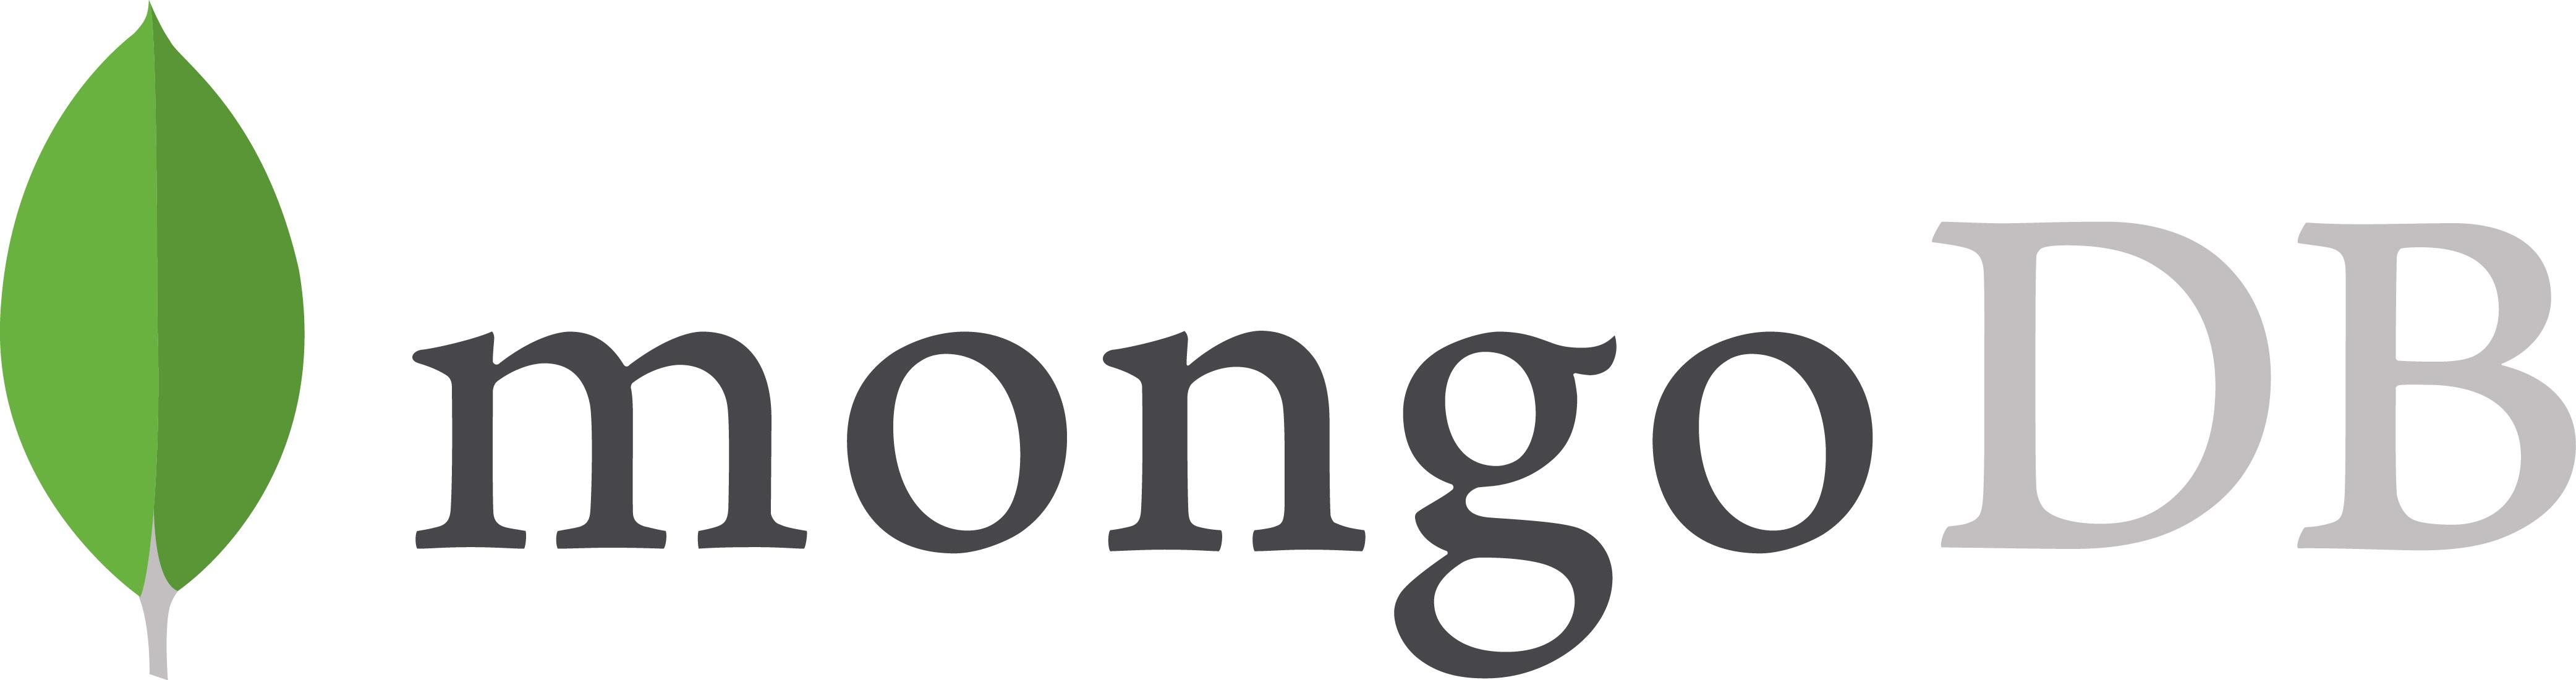 mongodb-logo-rgb-j6w271g1xn.jpg